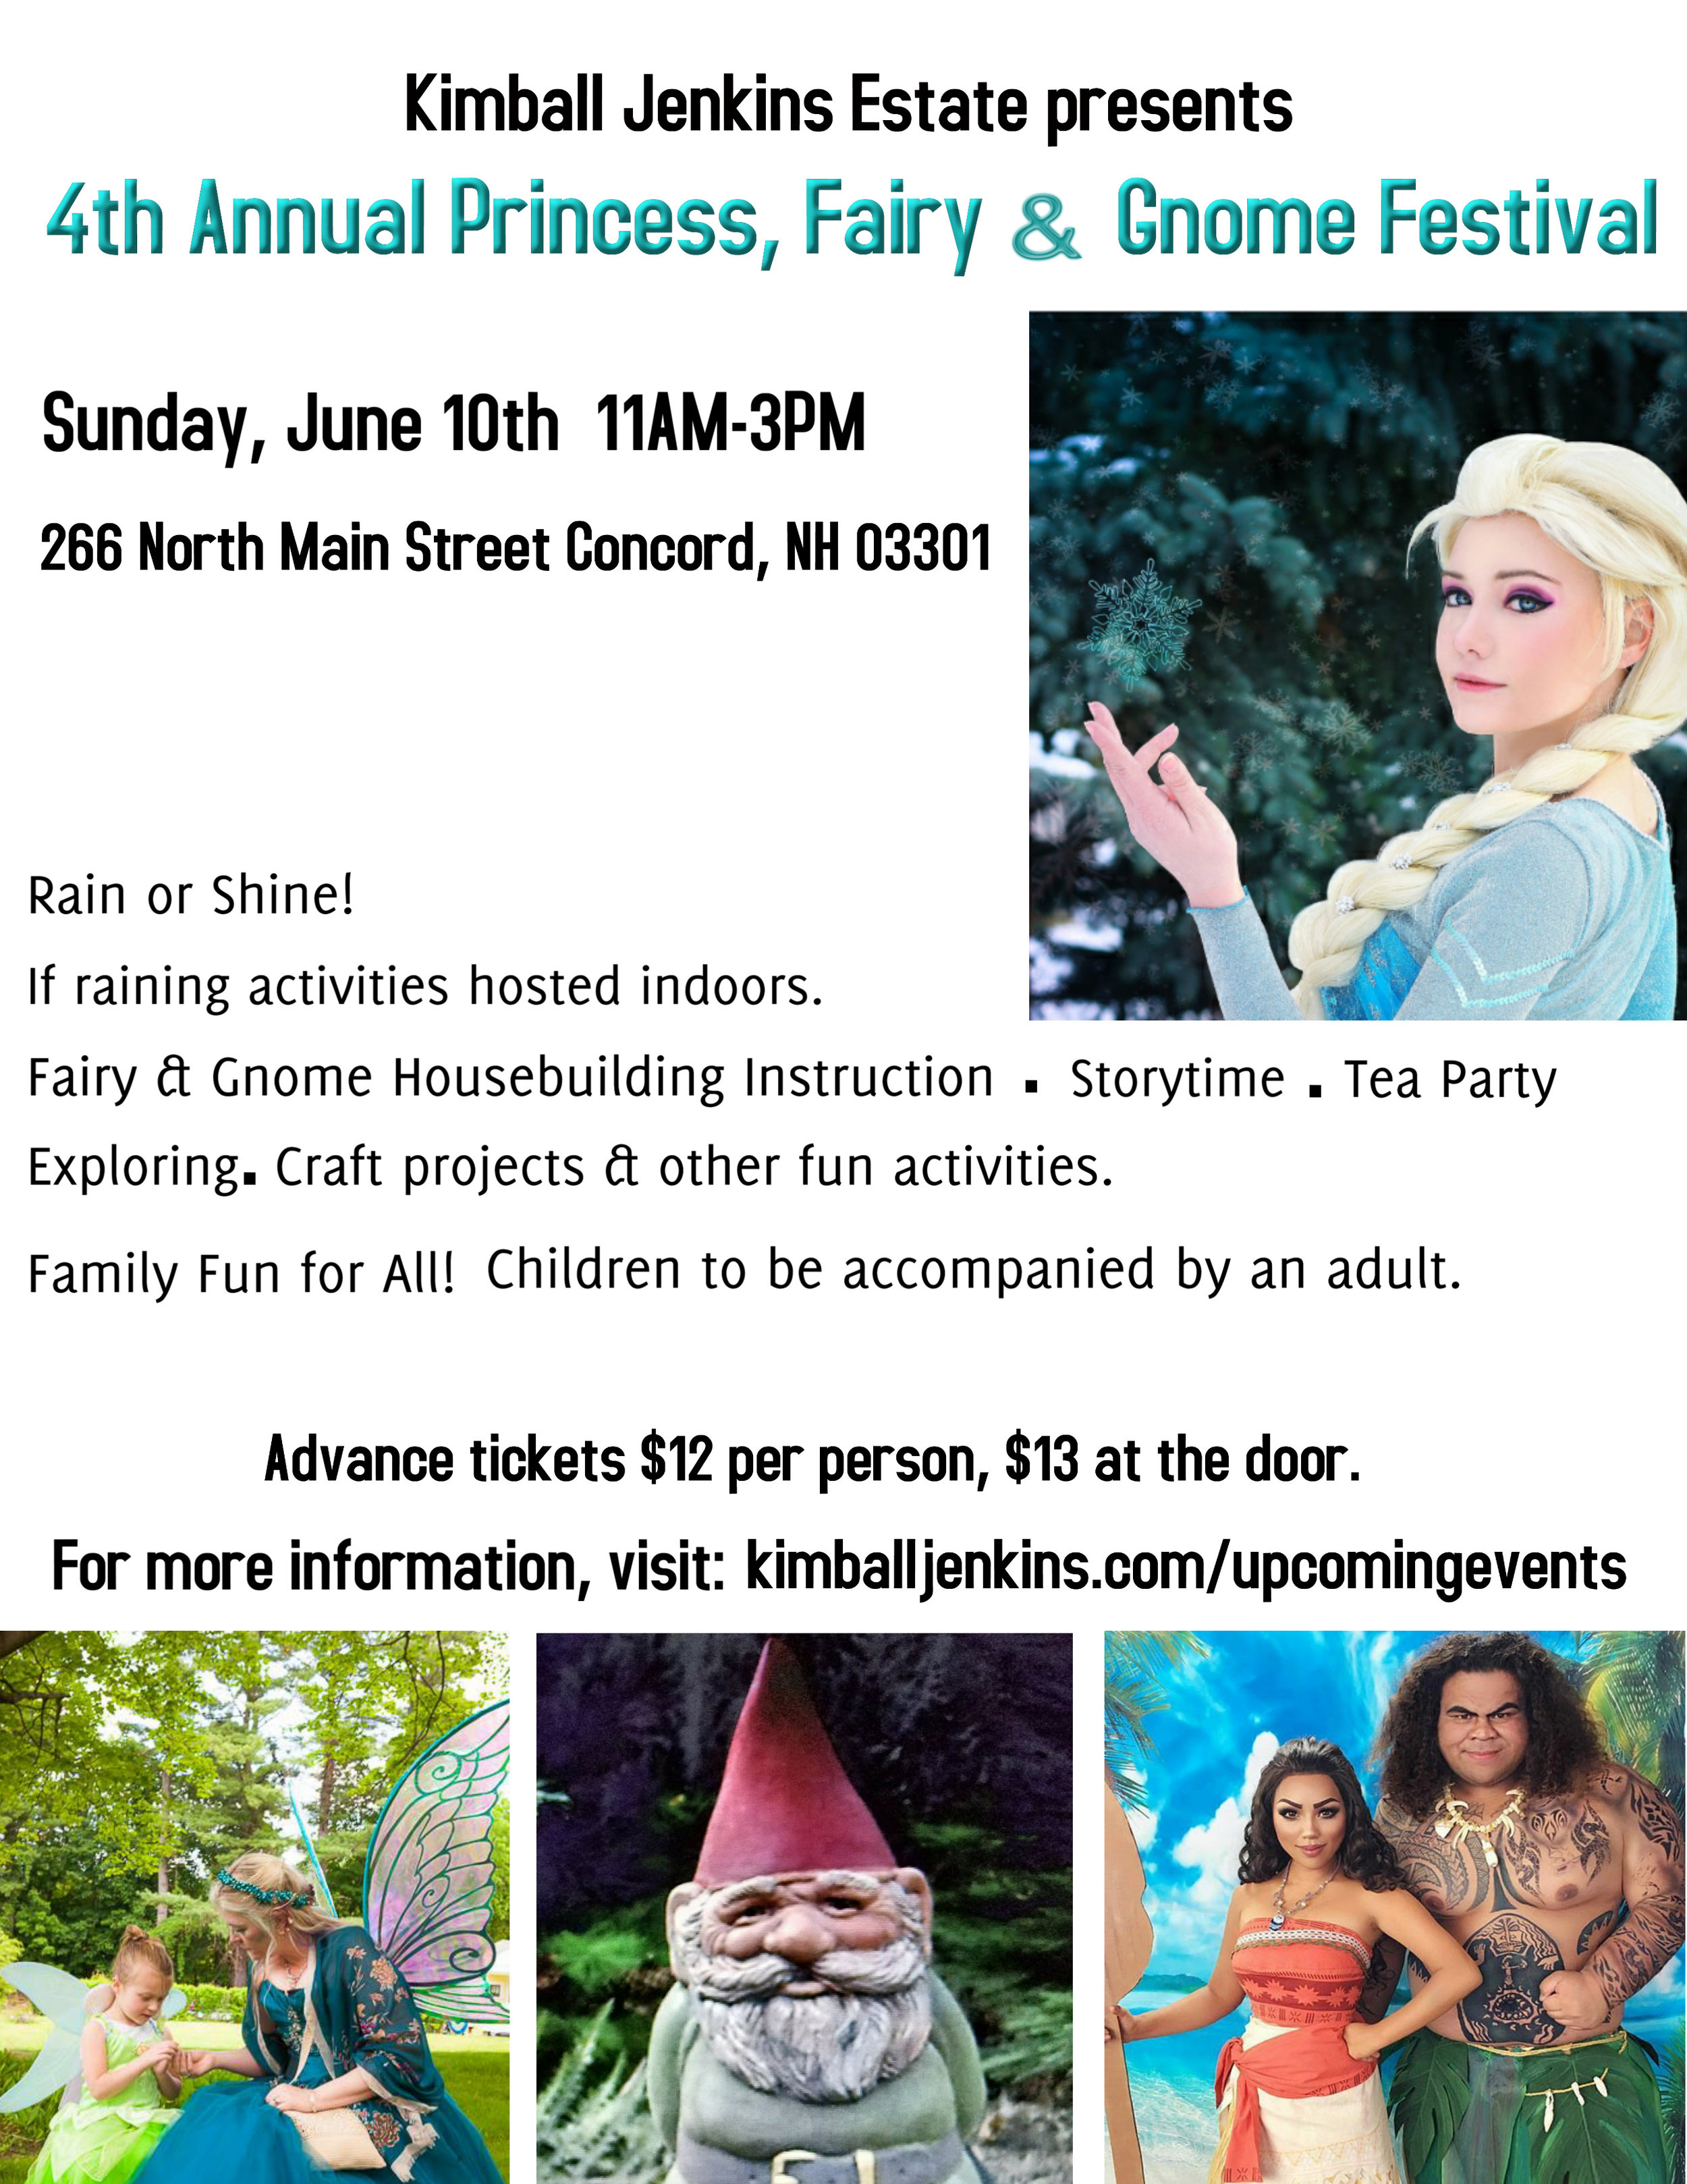 final princess fairy gnome festival flyer 2018.jpg